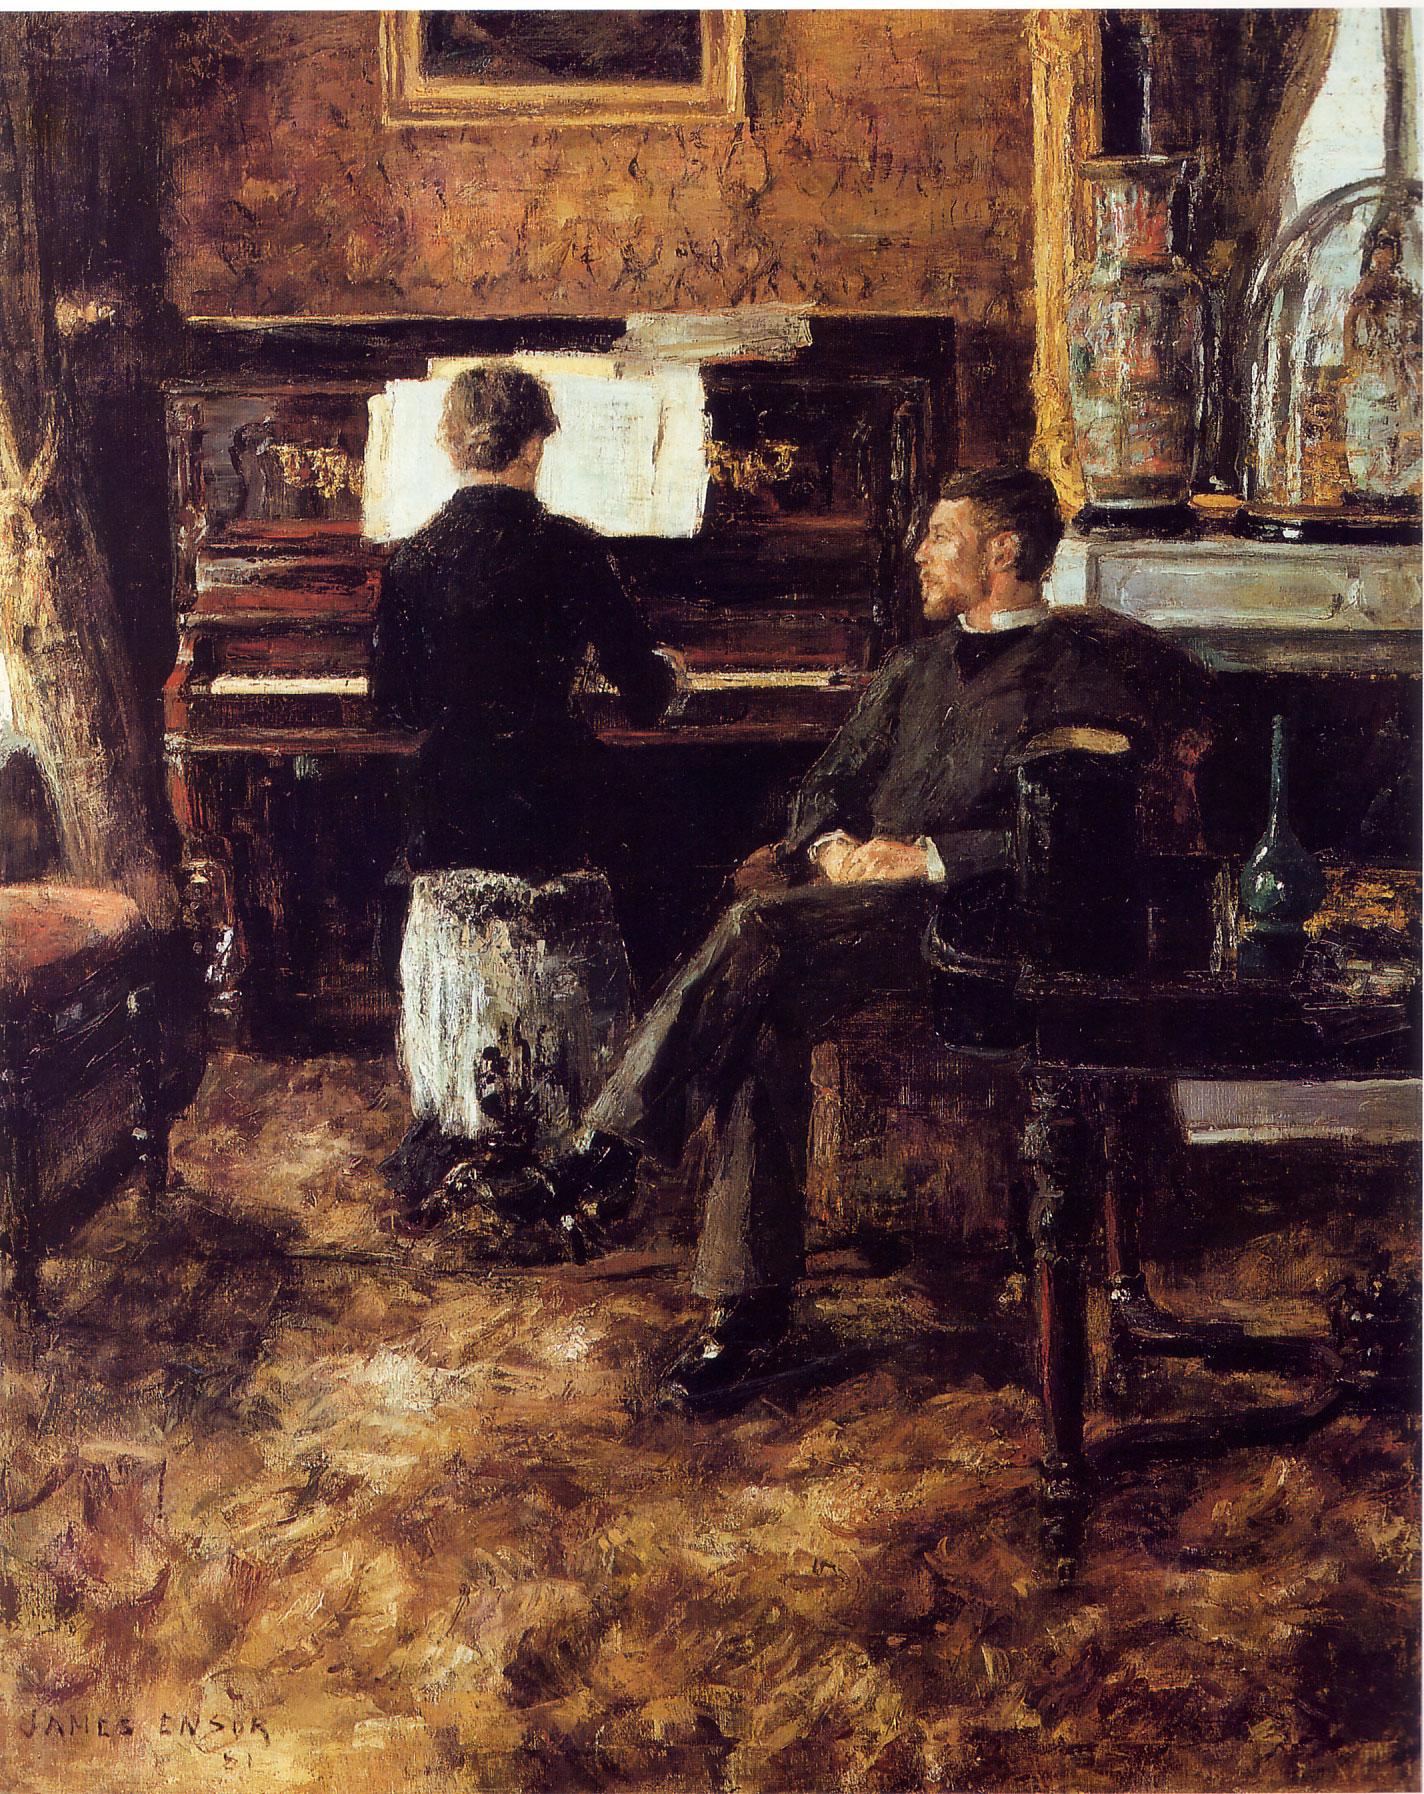 Живопись_James-Ensor_Russian-Music.-1881.jpg